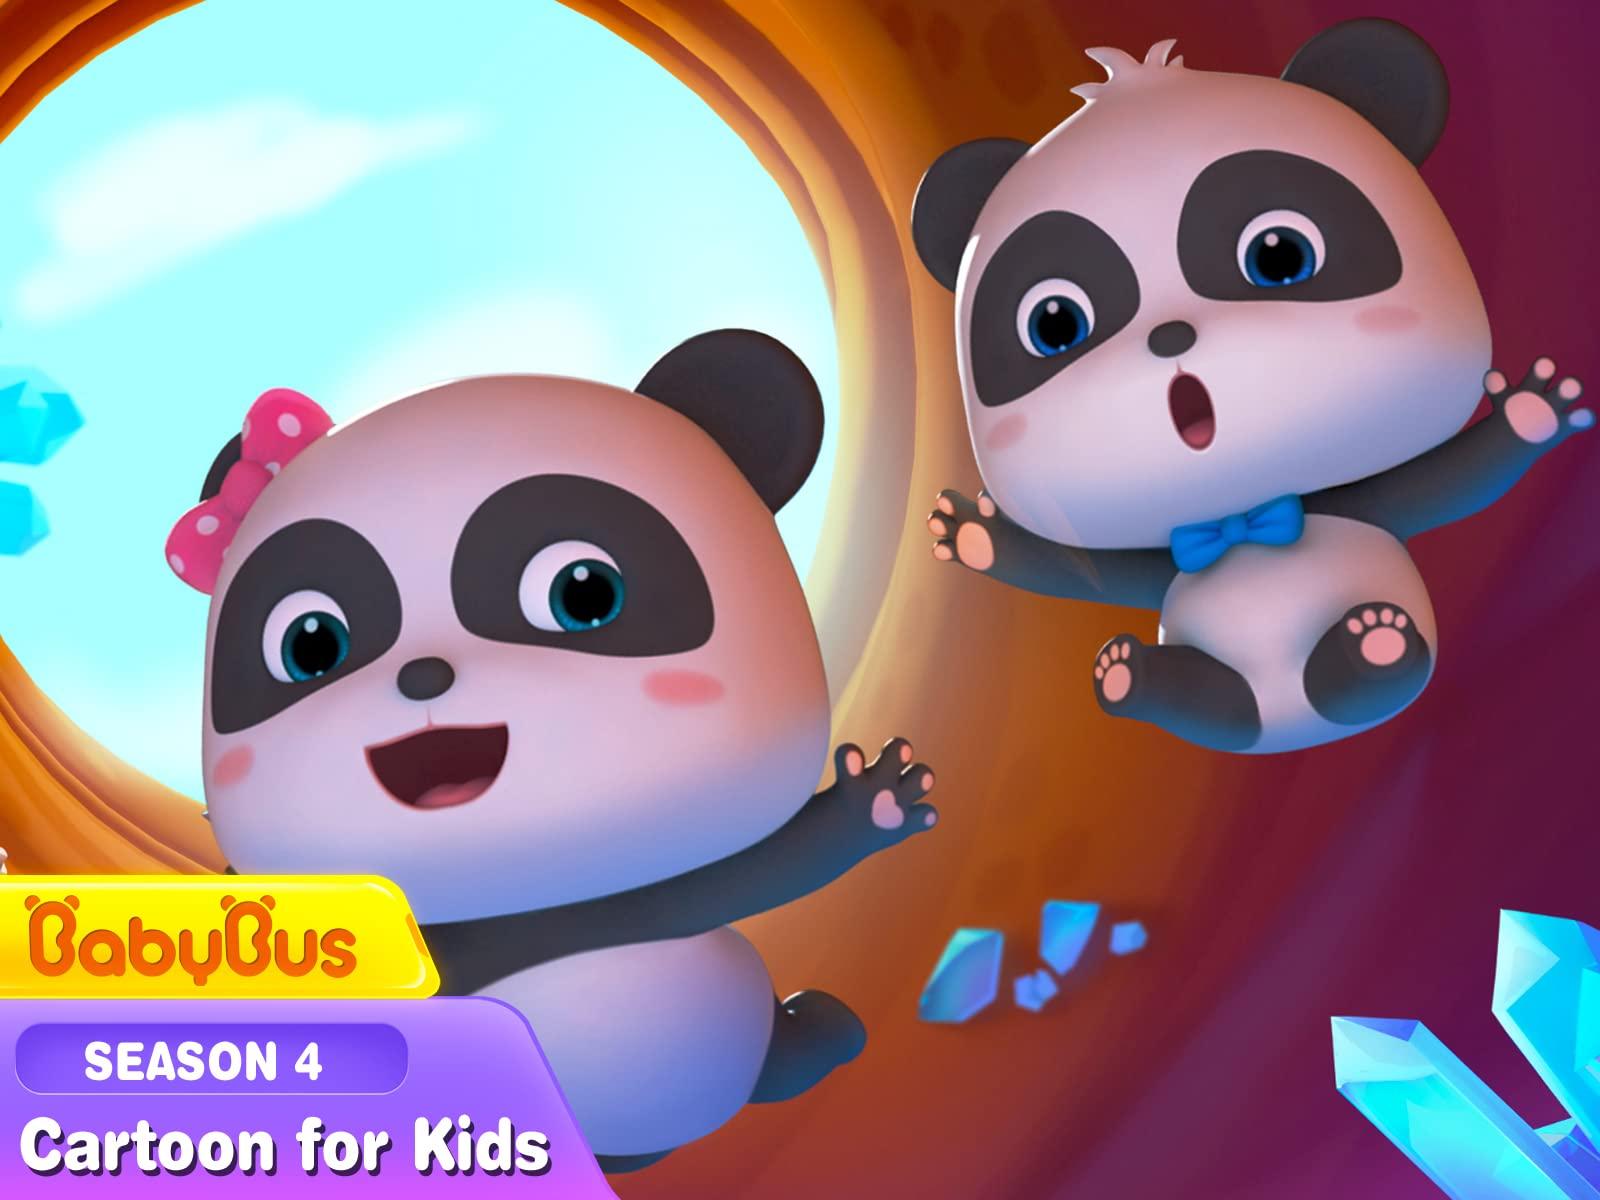 BabyBus - Cartoon for Kids